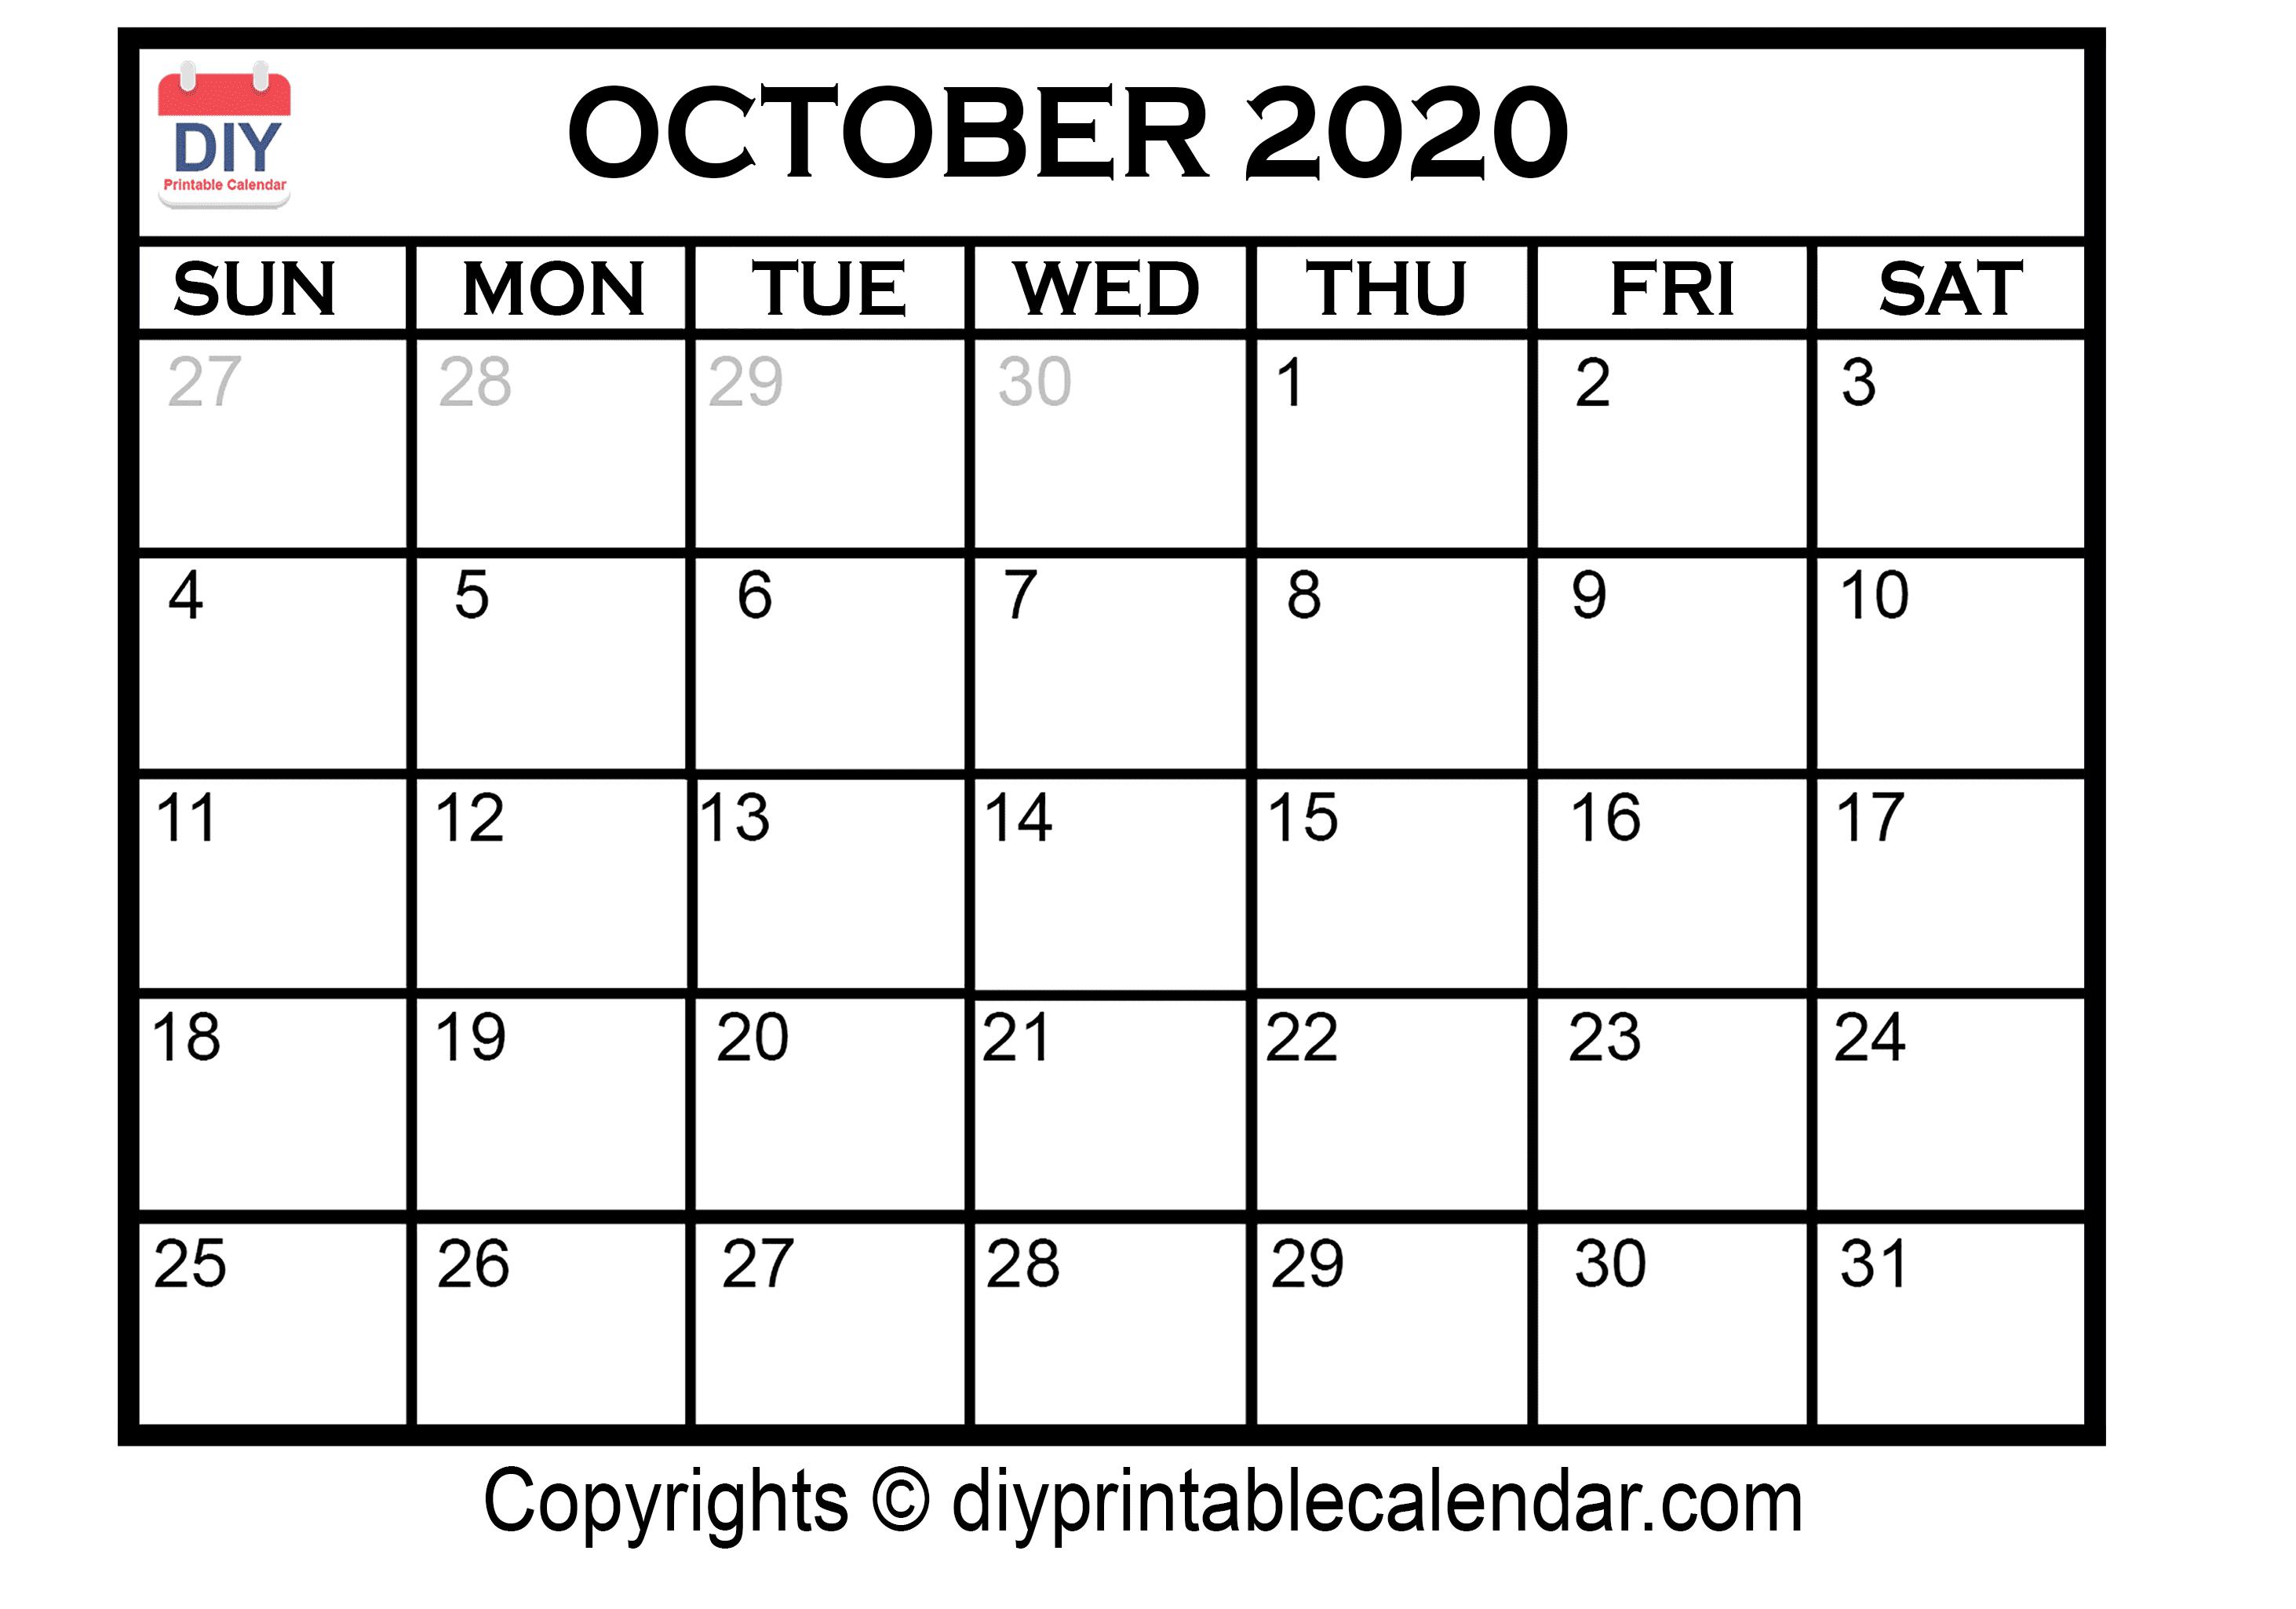 October 2020 Printable Calendar Template